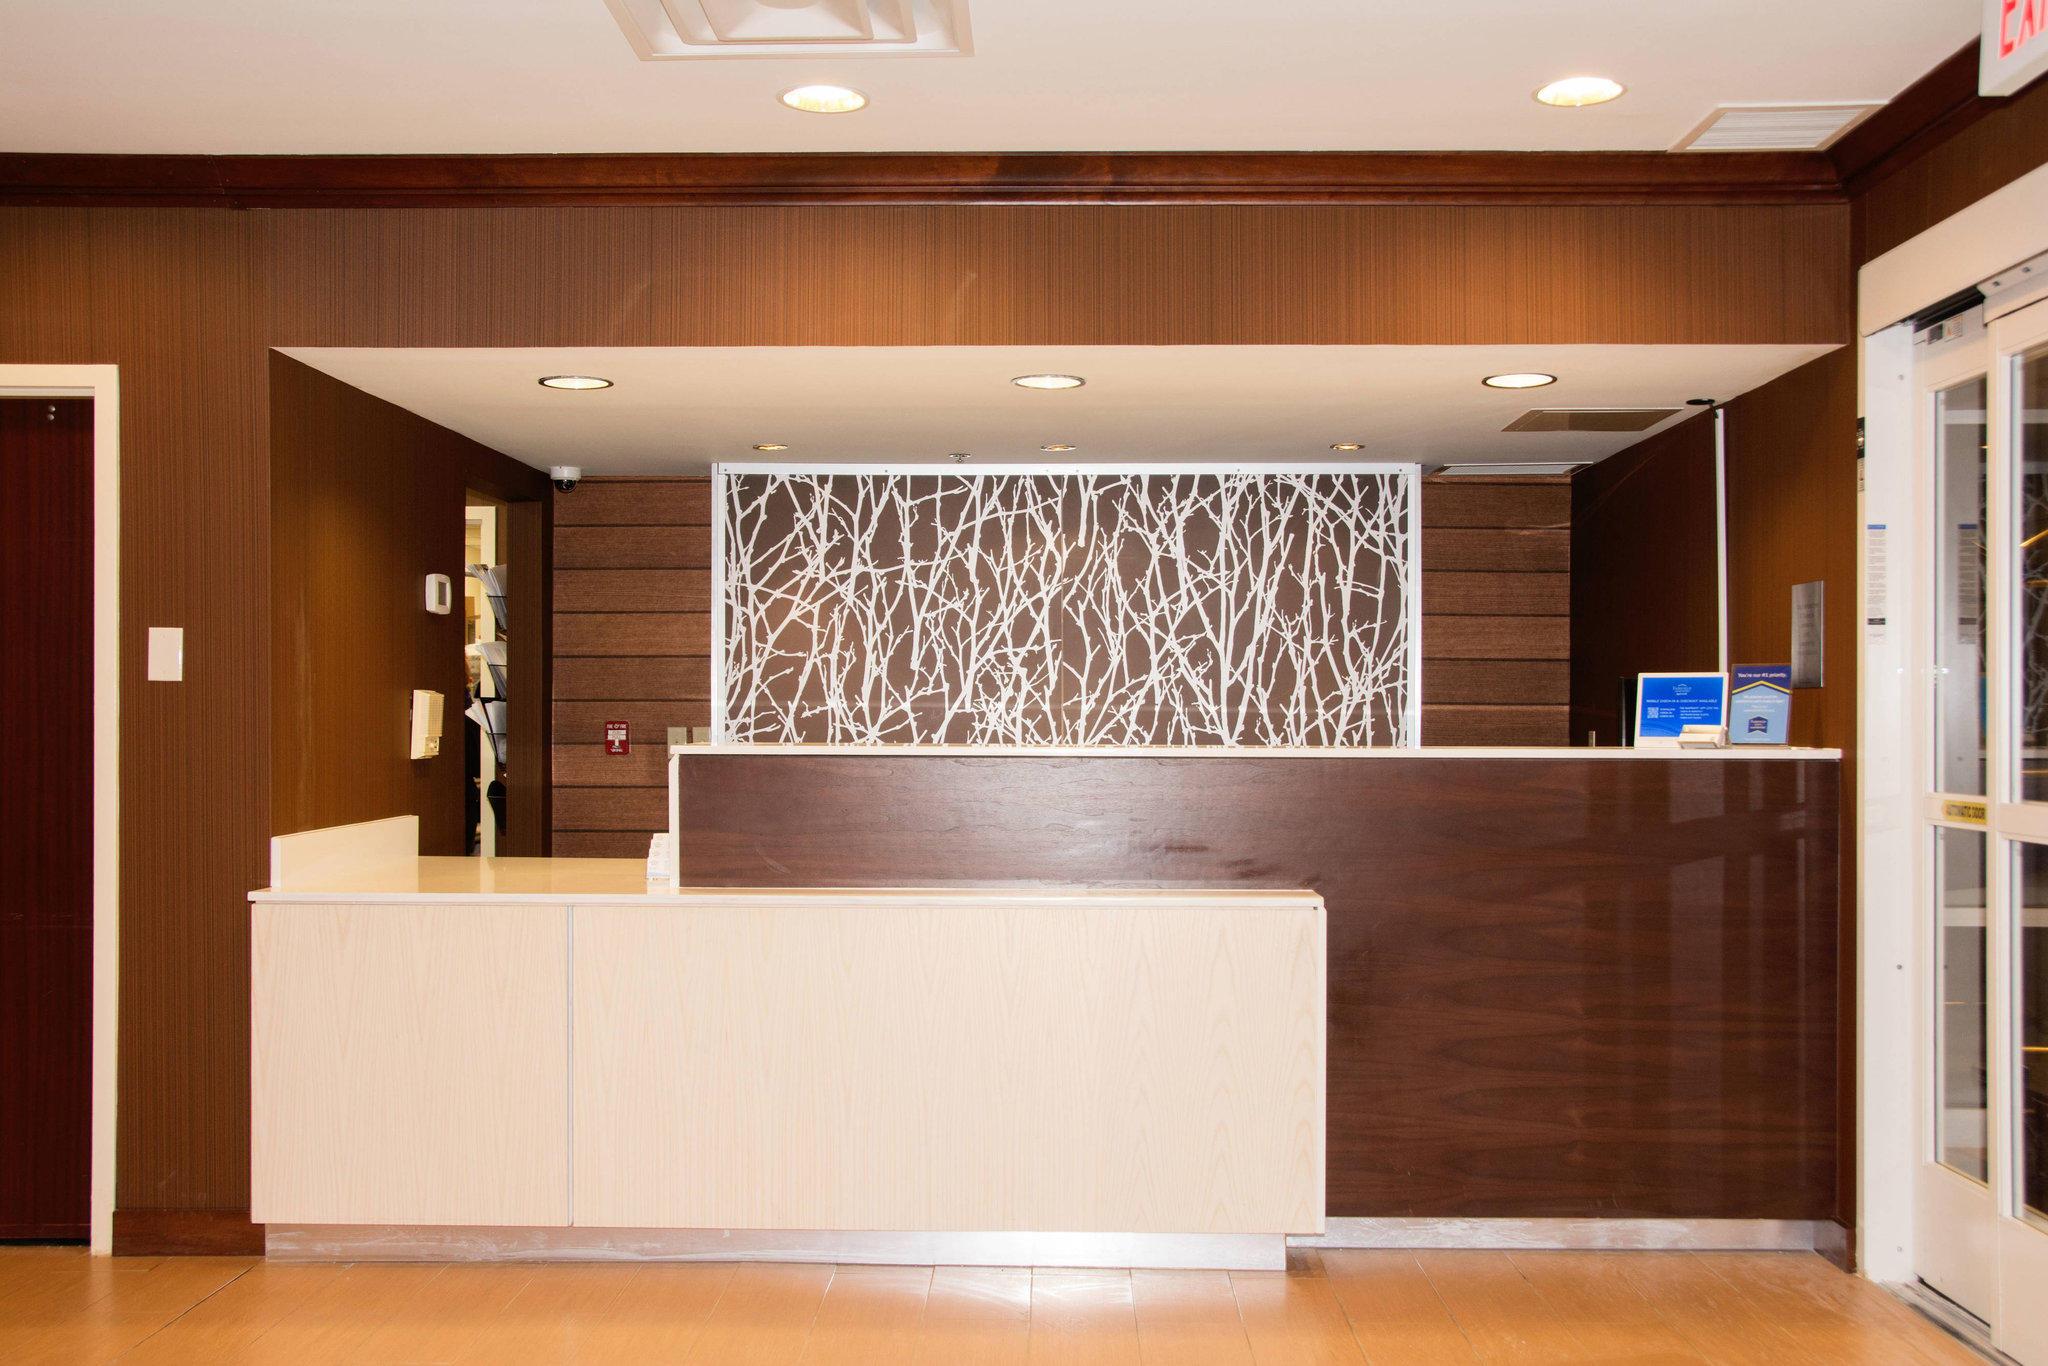 Fairfield Inn & Suites by Marriott Butler